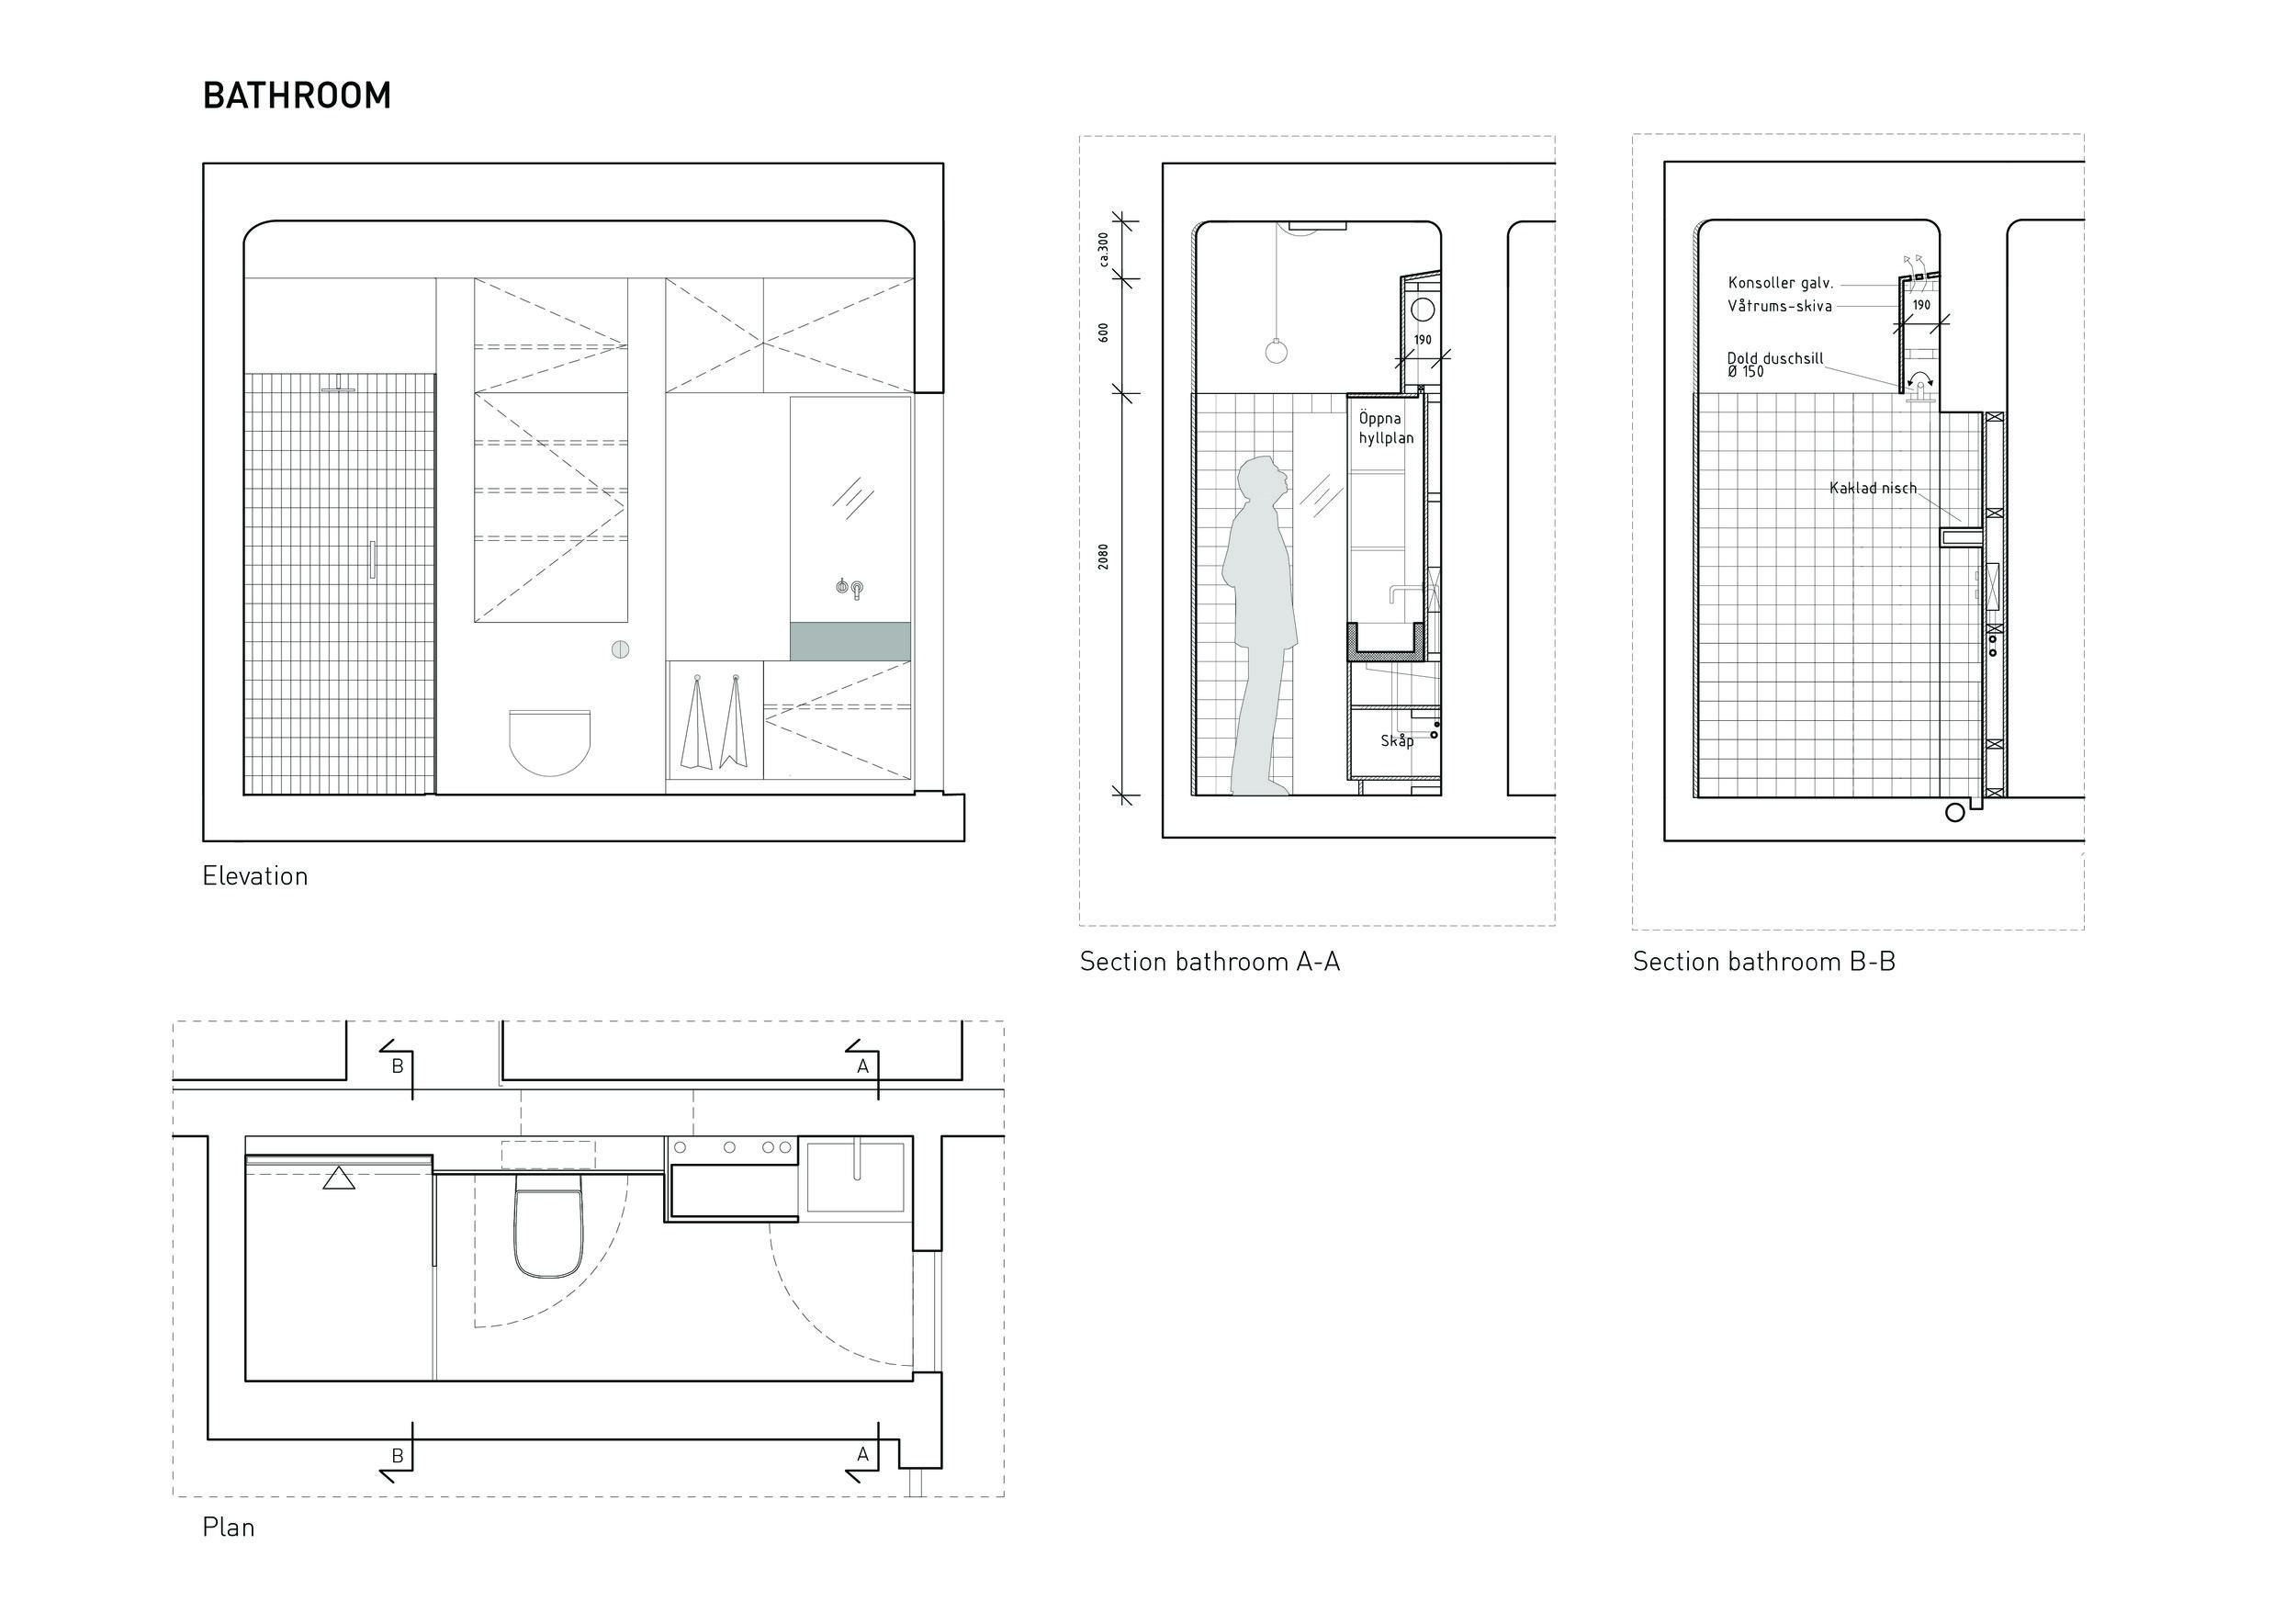 04_bathroom-01-01.jpg